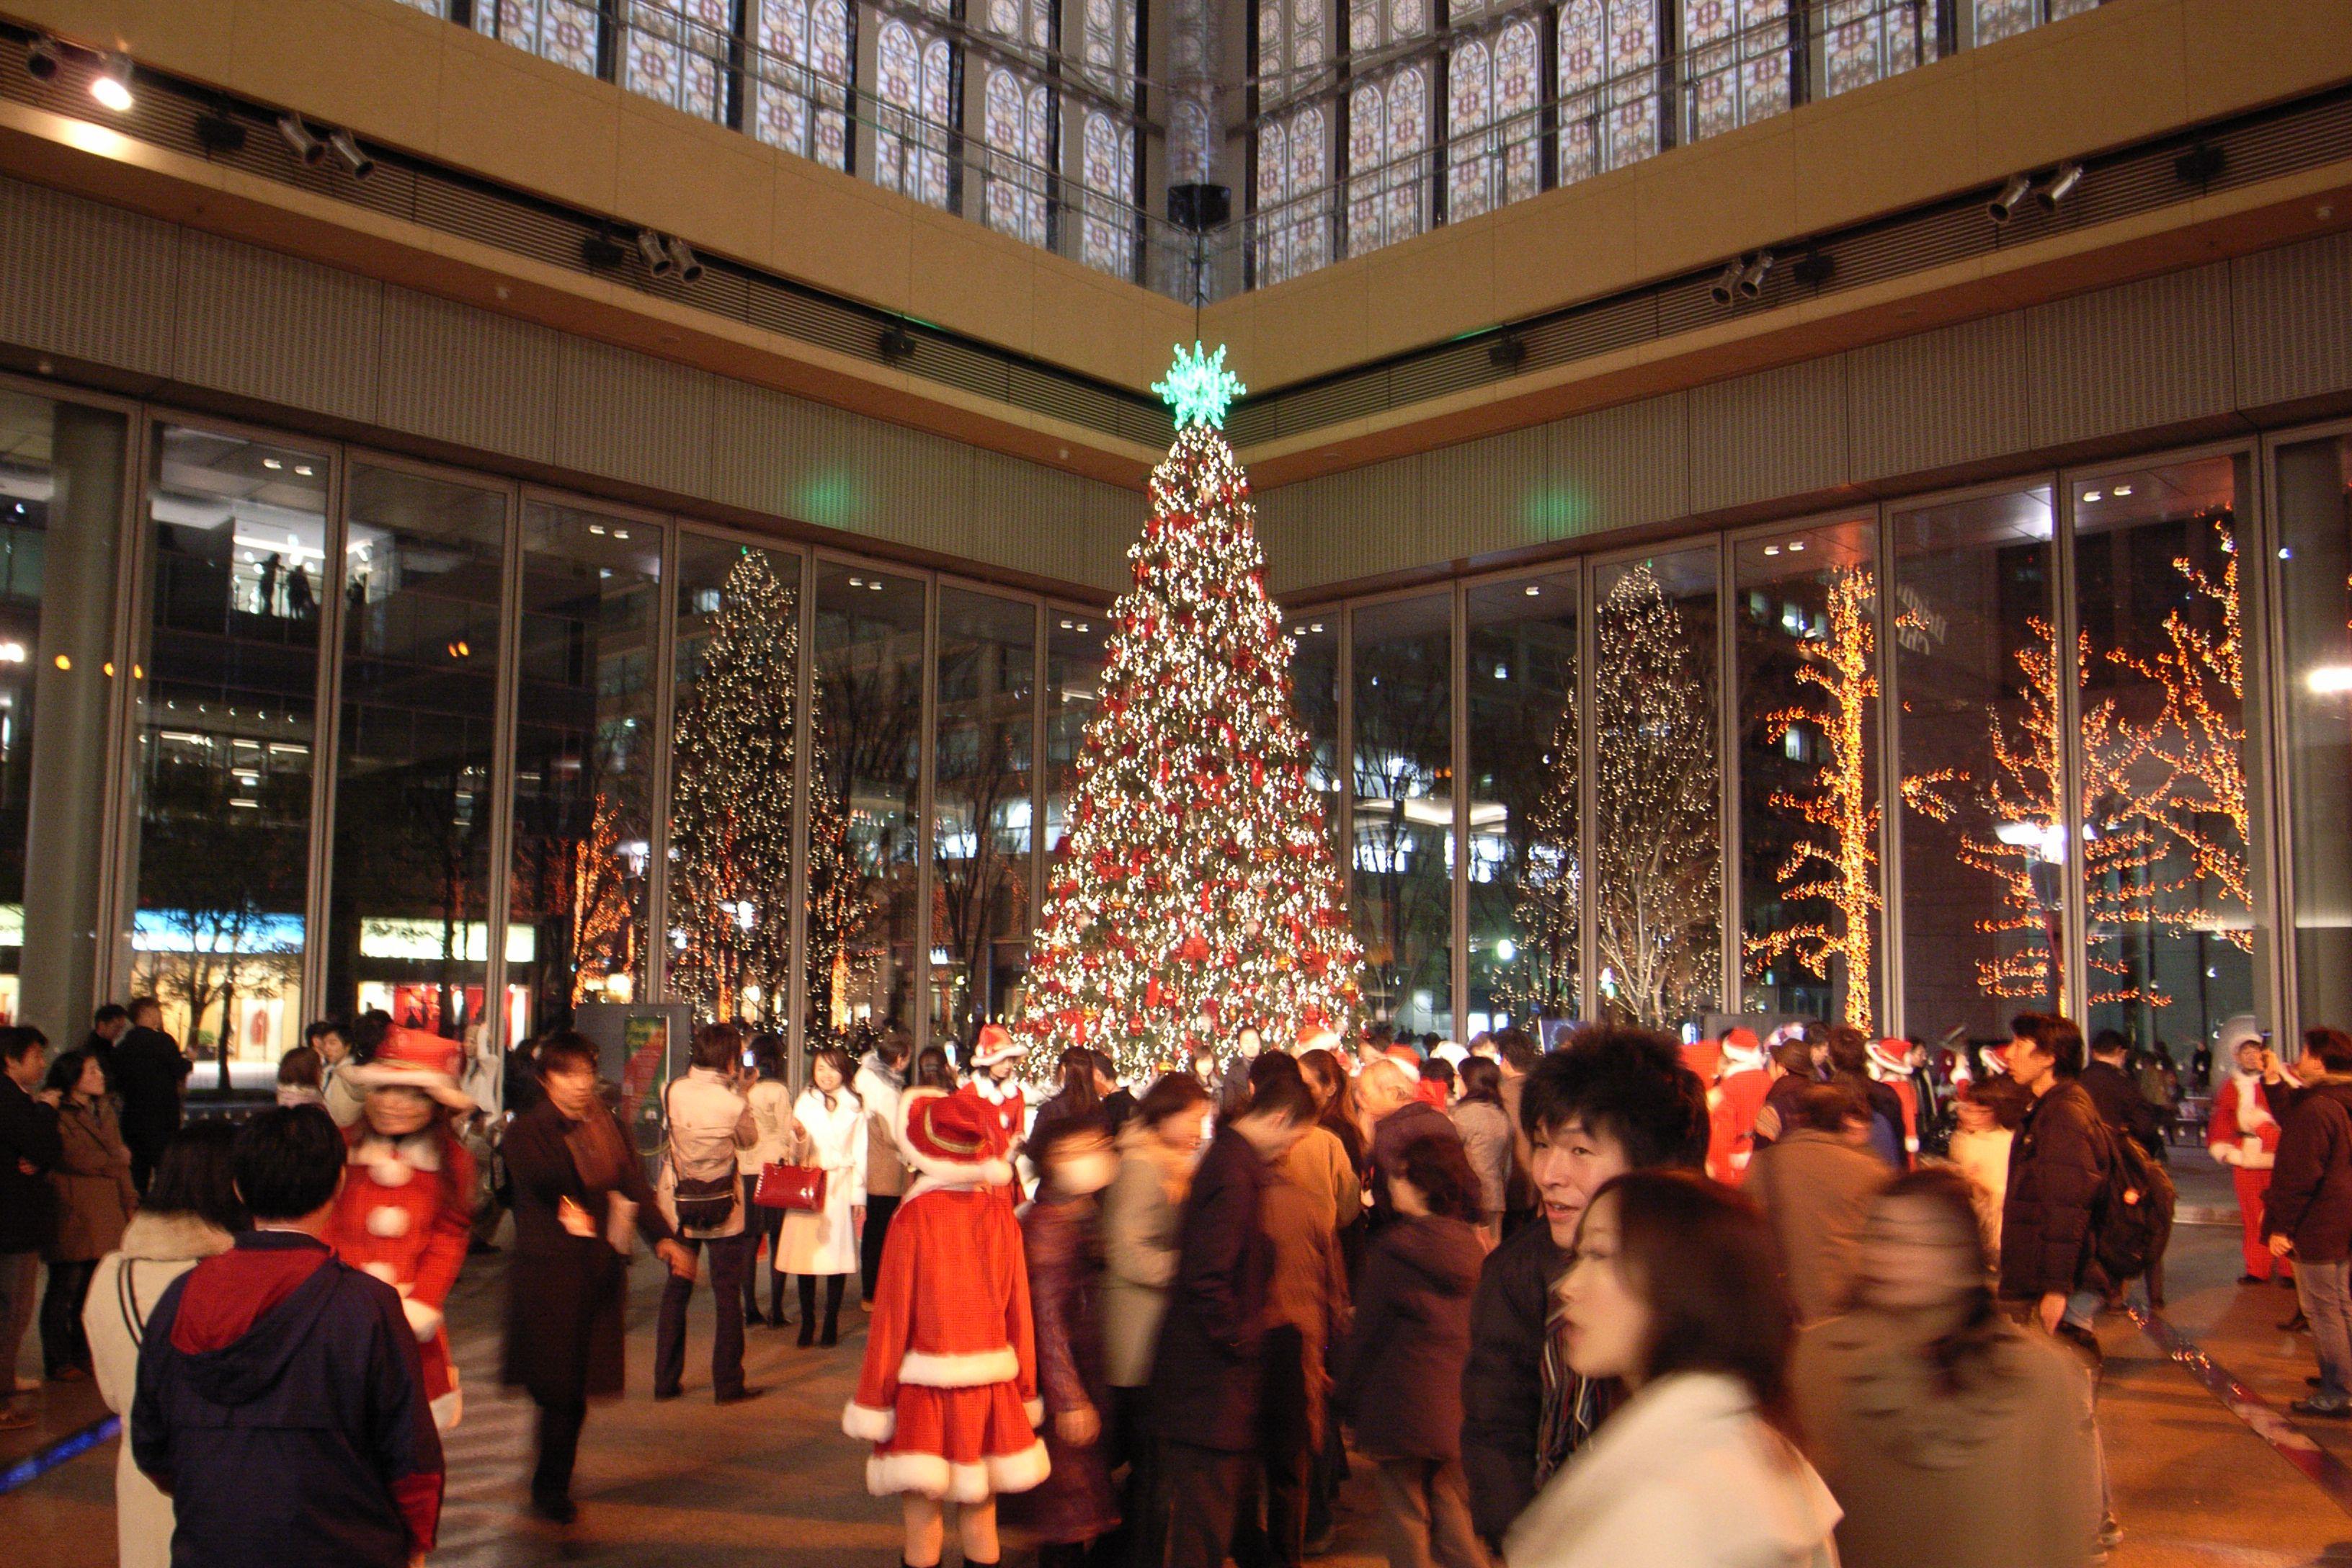 Christmas festival ideas for church - Christmas In Asia